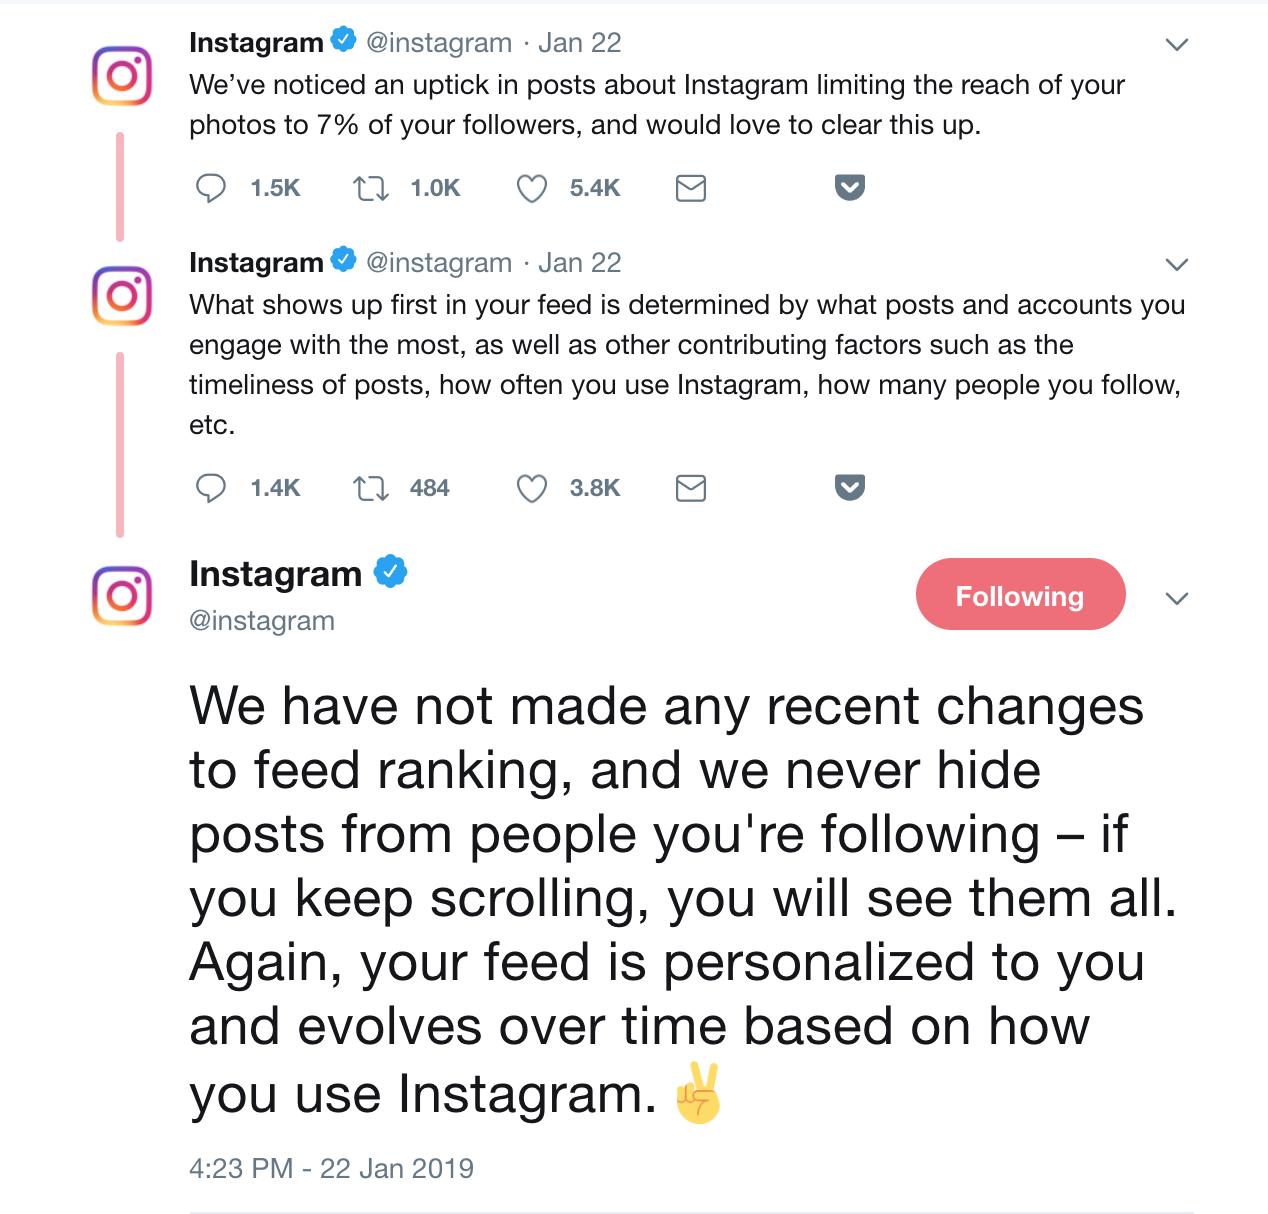 instagram limits reach